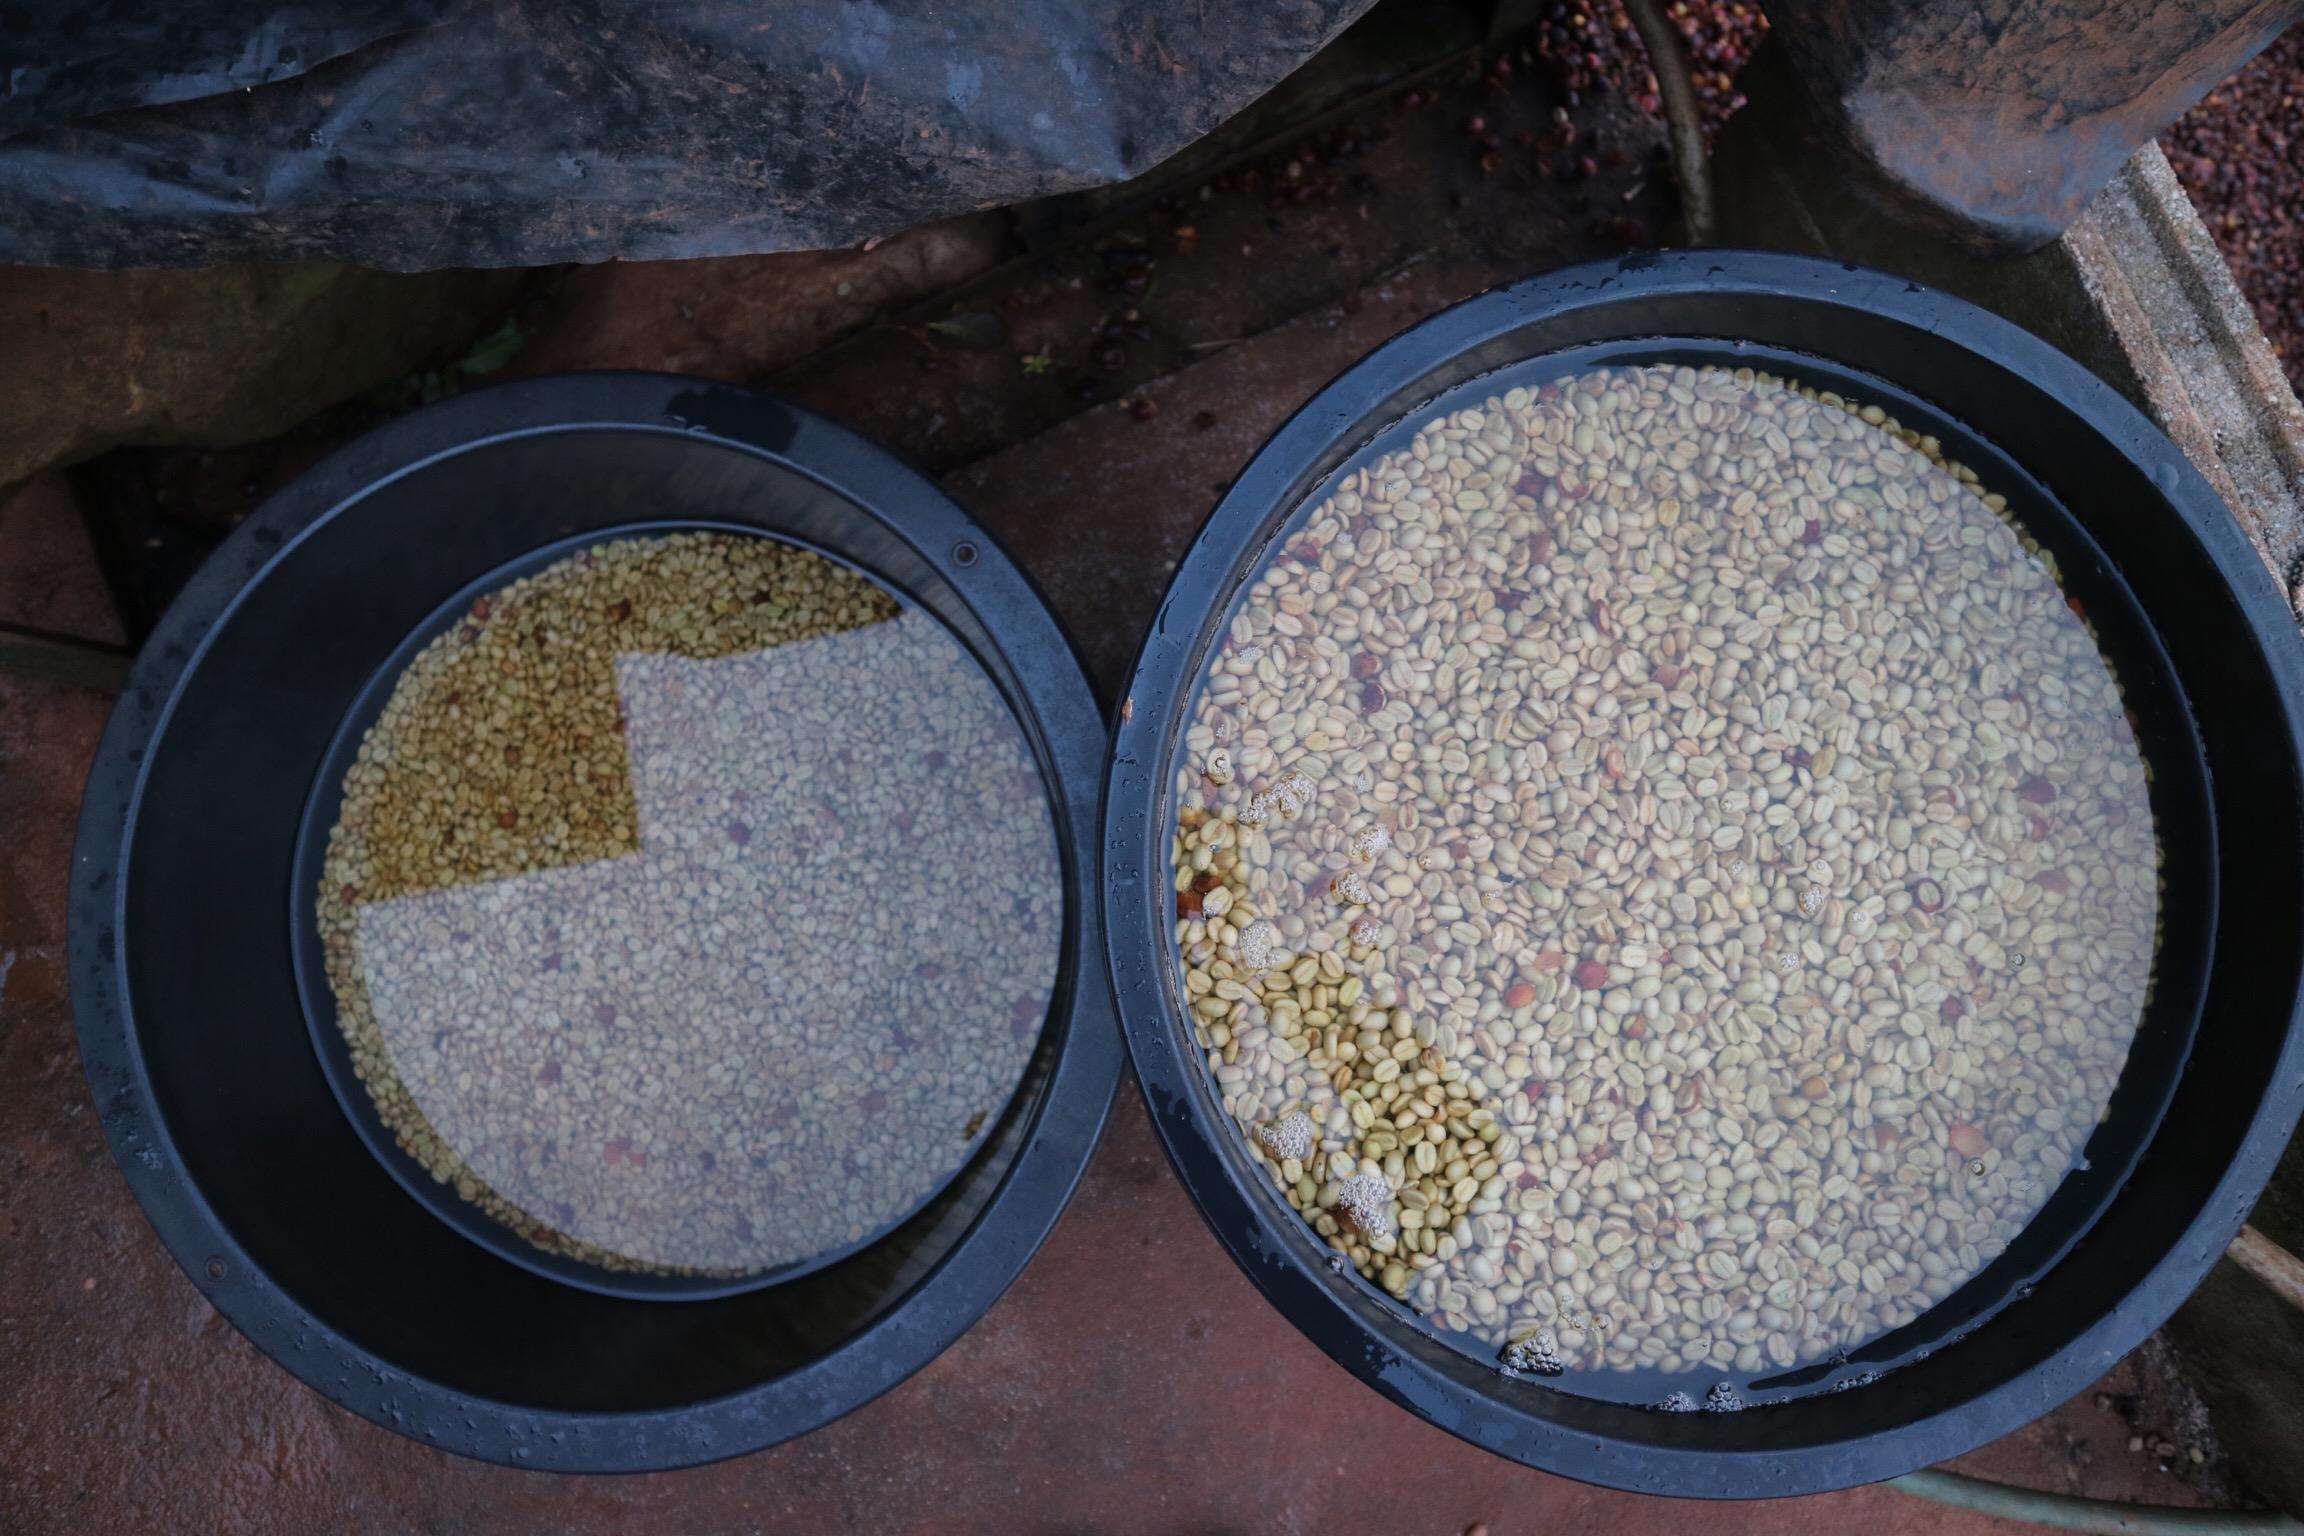 Akor's post-fermentation soak tubs help his wet parchment to find moisture balance.